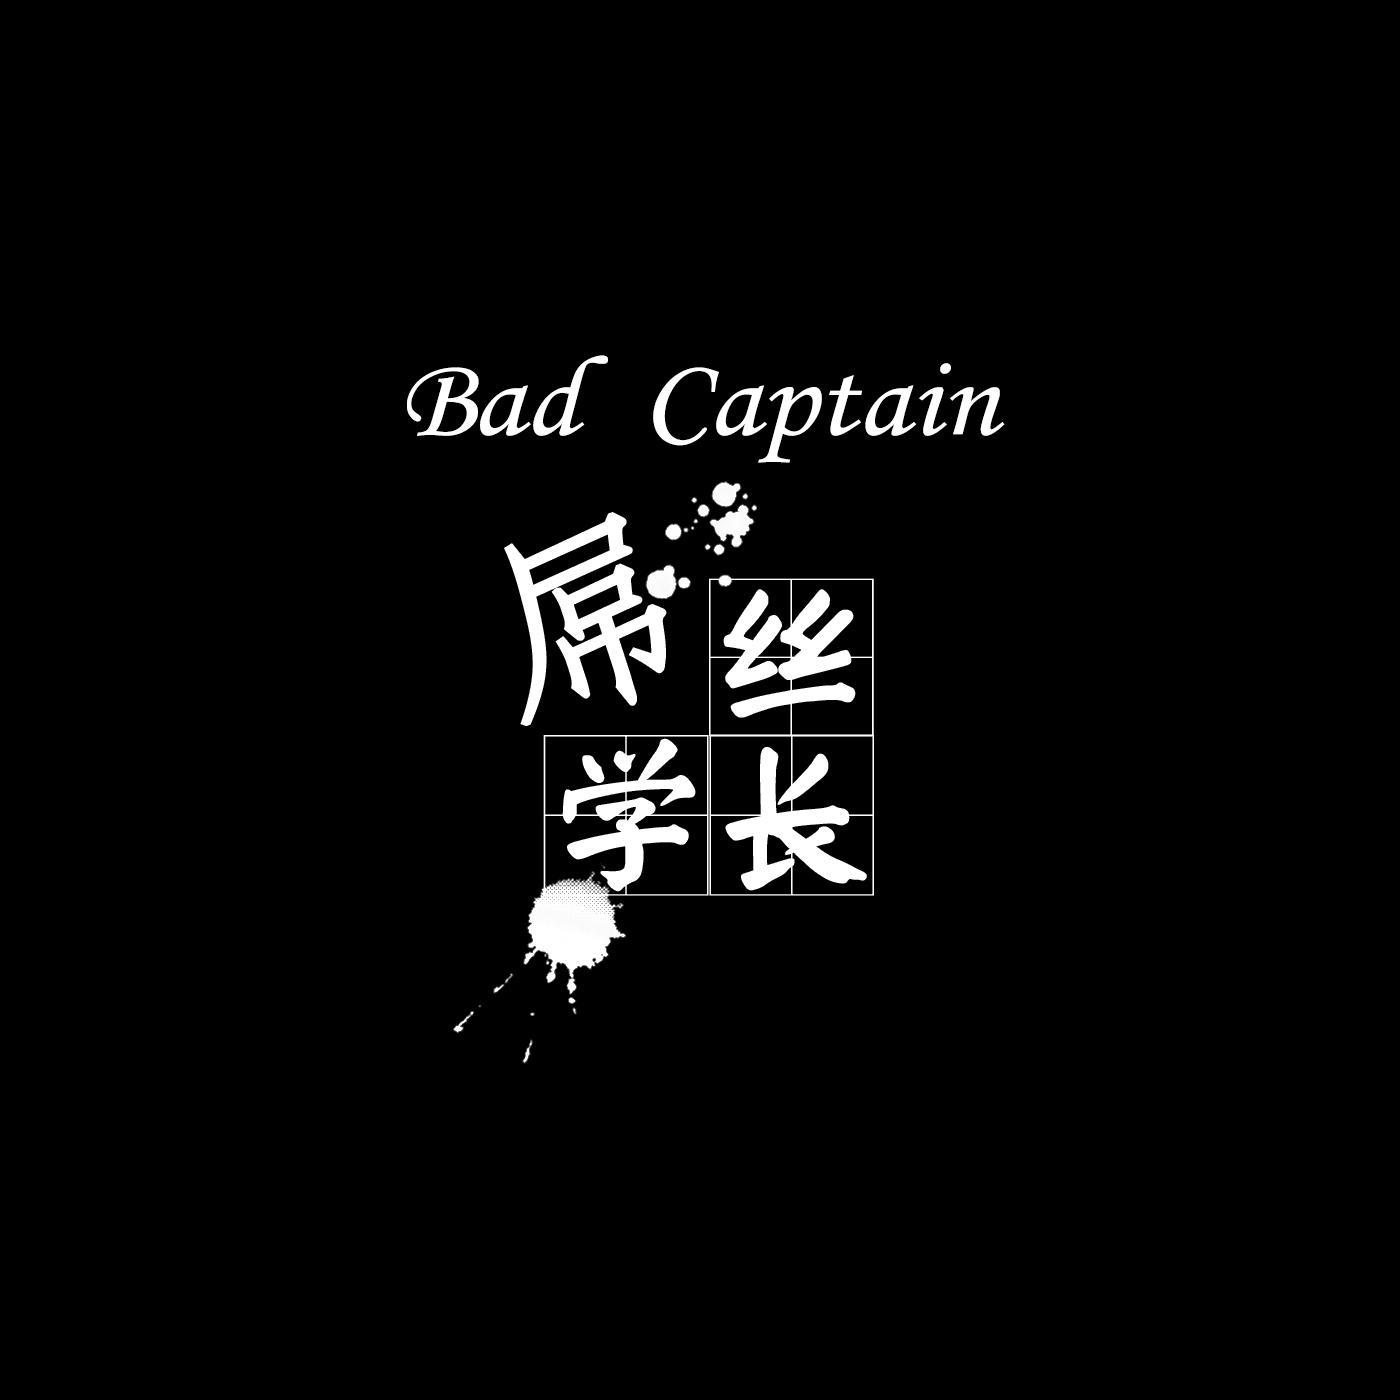 <![CDATA[BadCaptain]]>